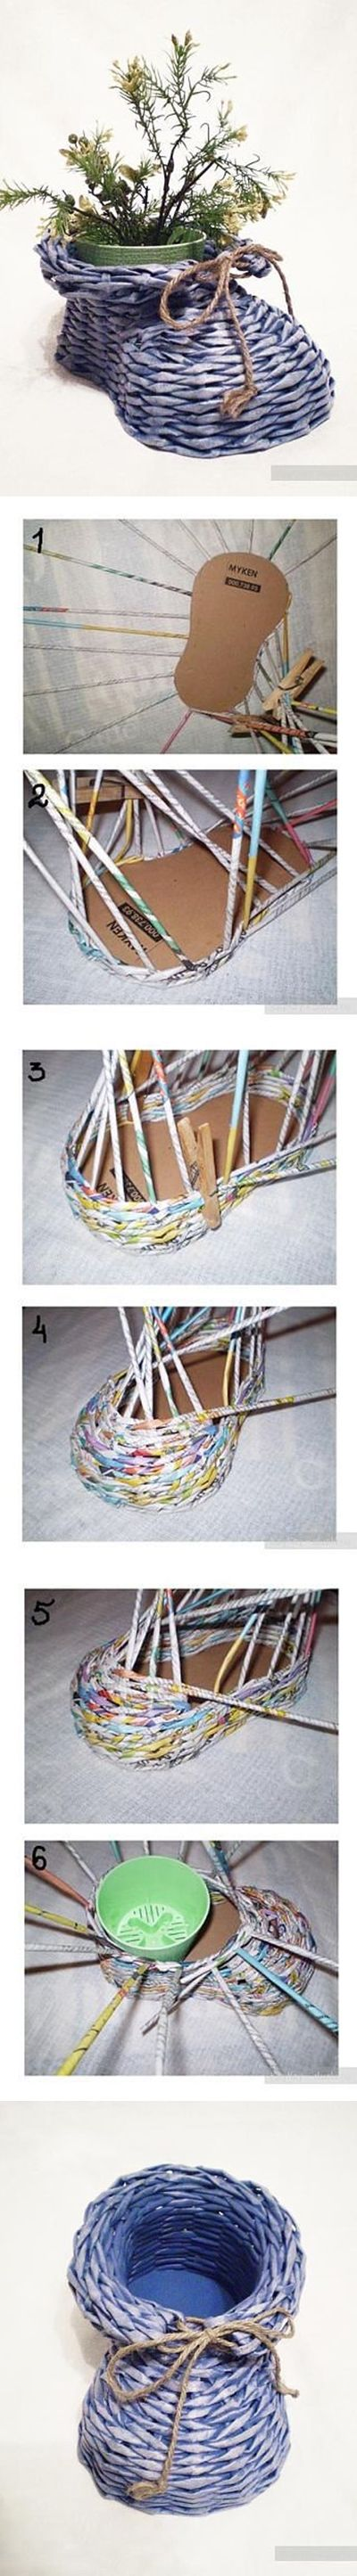 DIY Newpaper Roll Woven Shoe Vase | www.FabArtDIY.com LIKE Us on Facebook ==> https://www.facebook.com/FabArtDIY